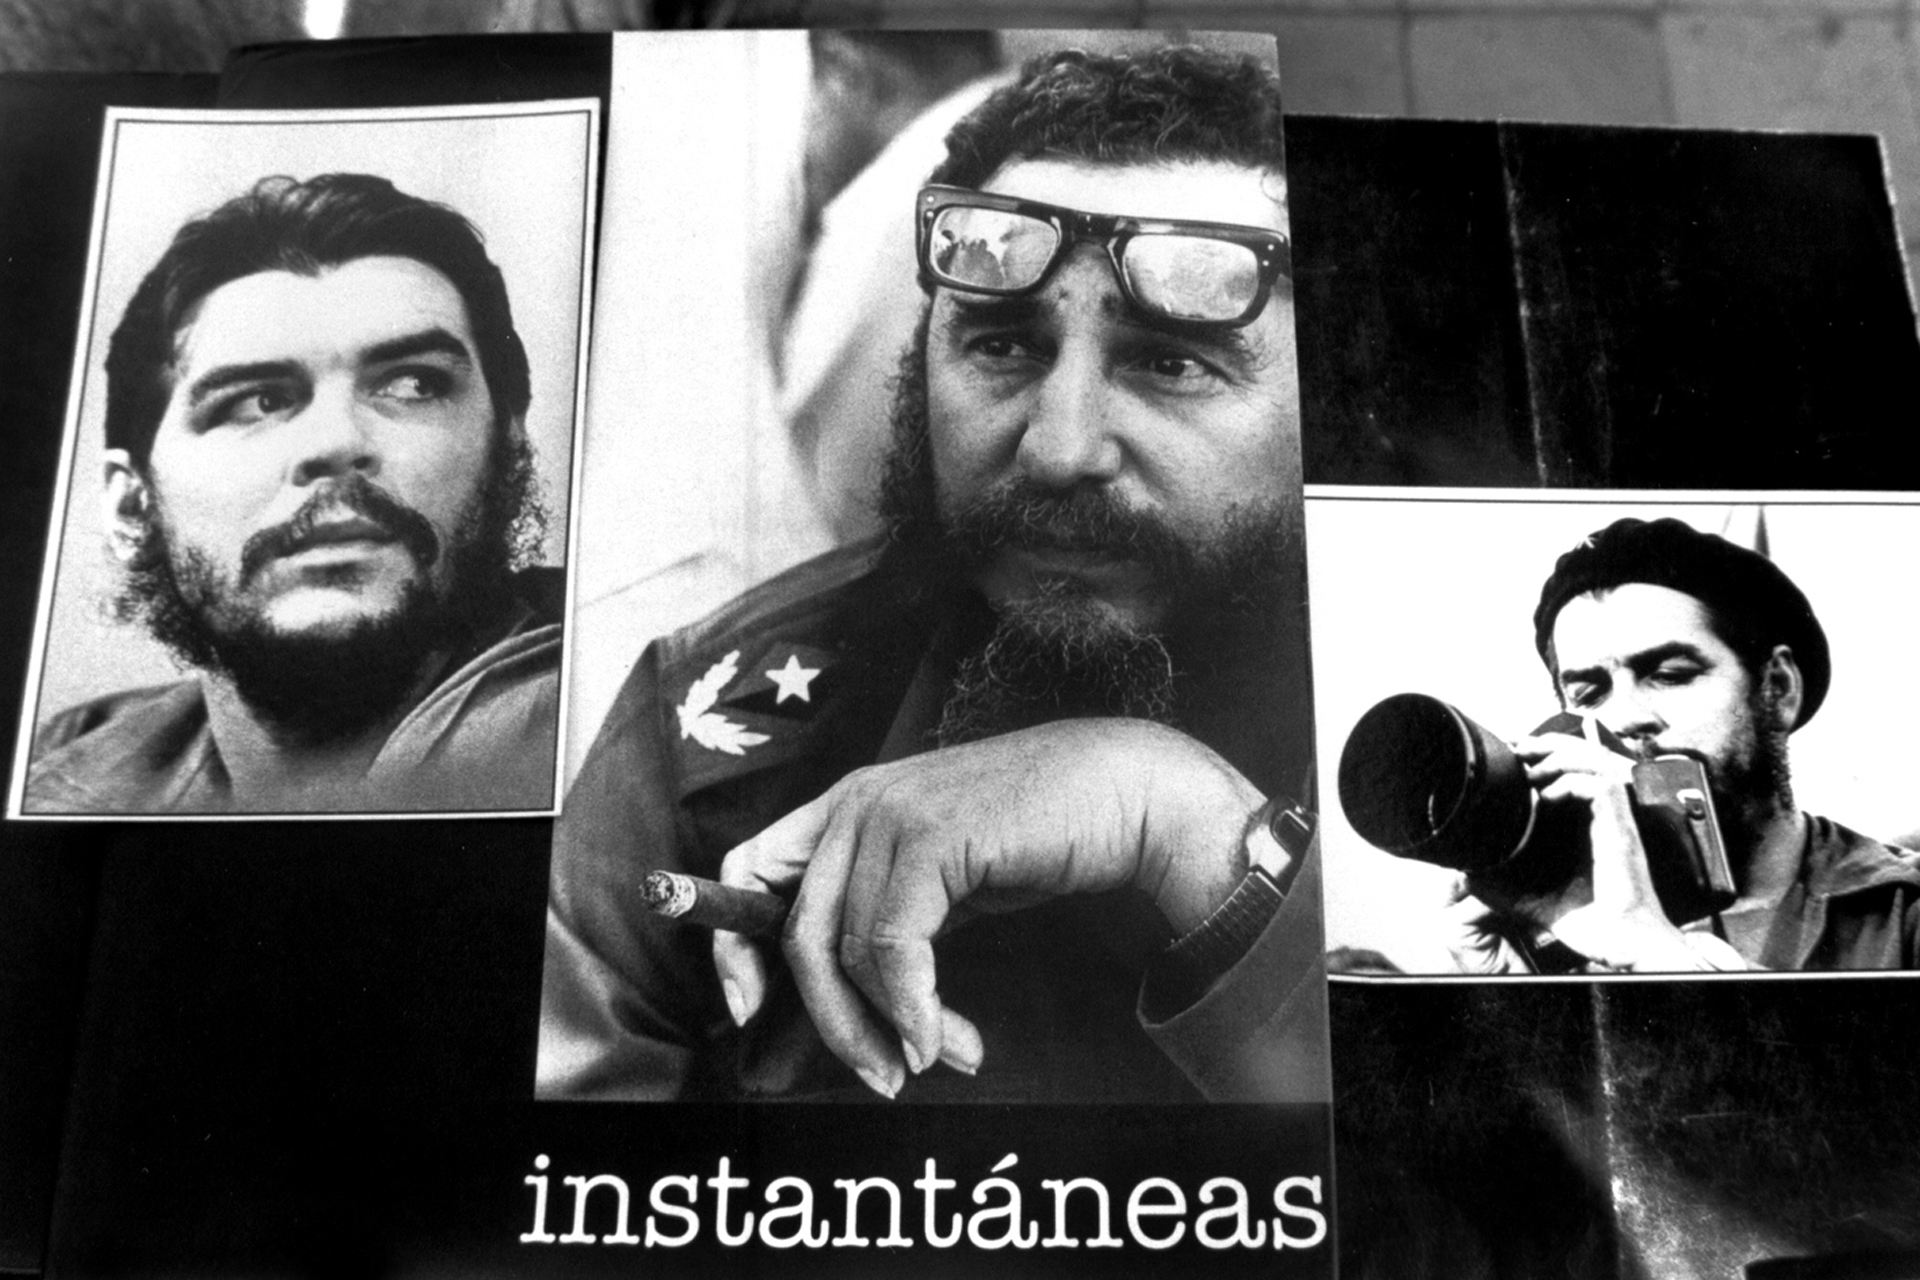 Instantaneas 001